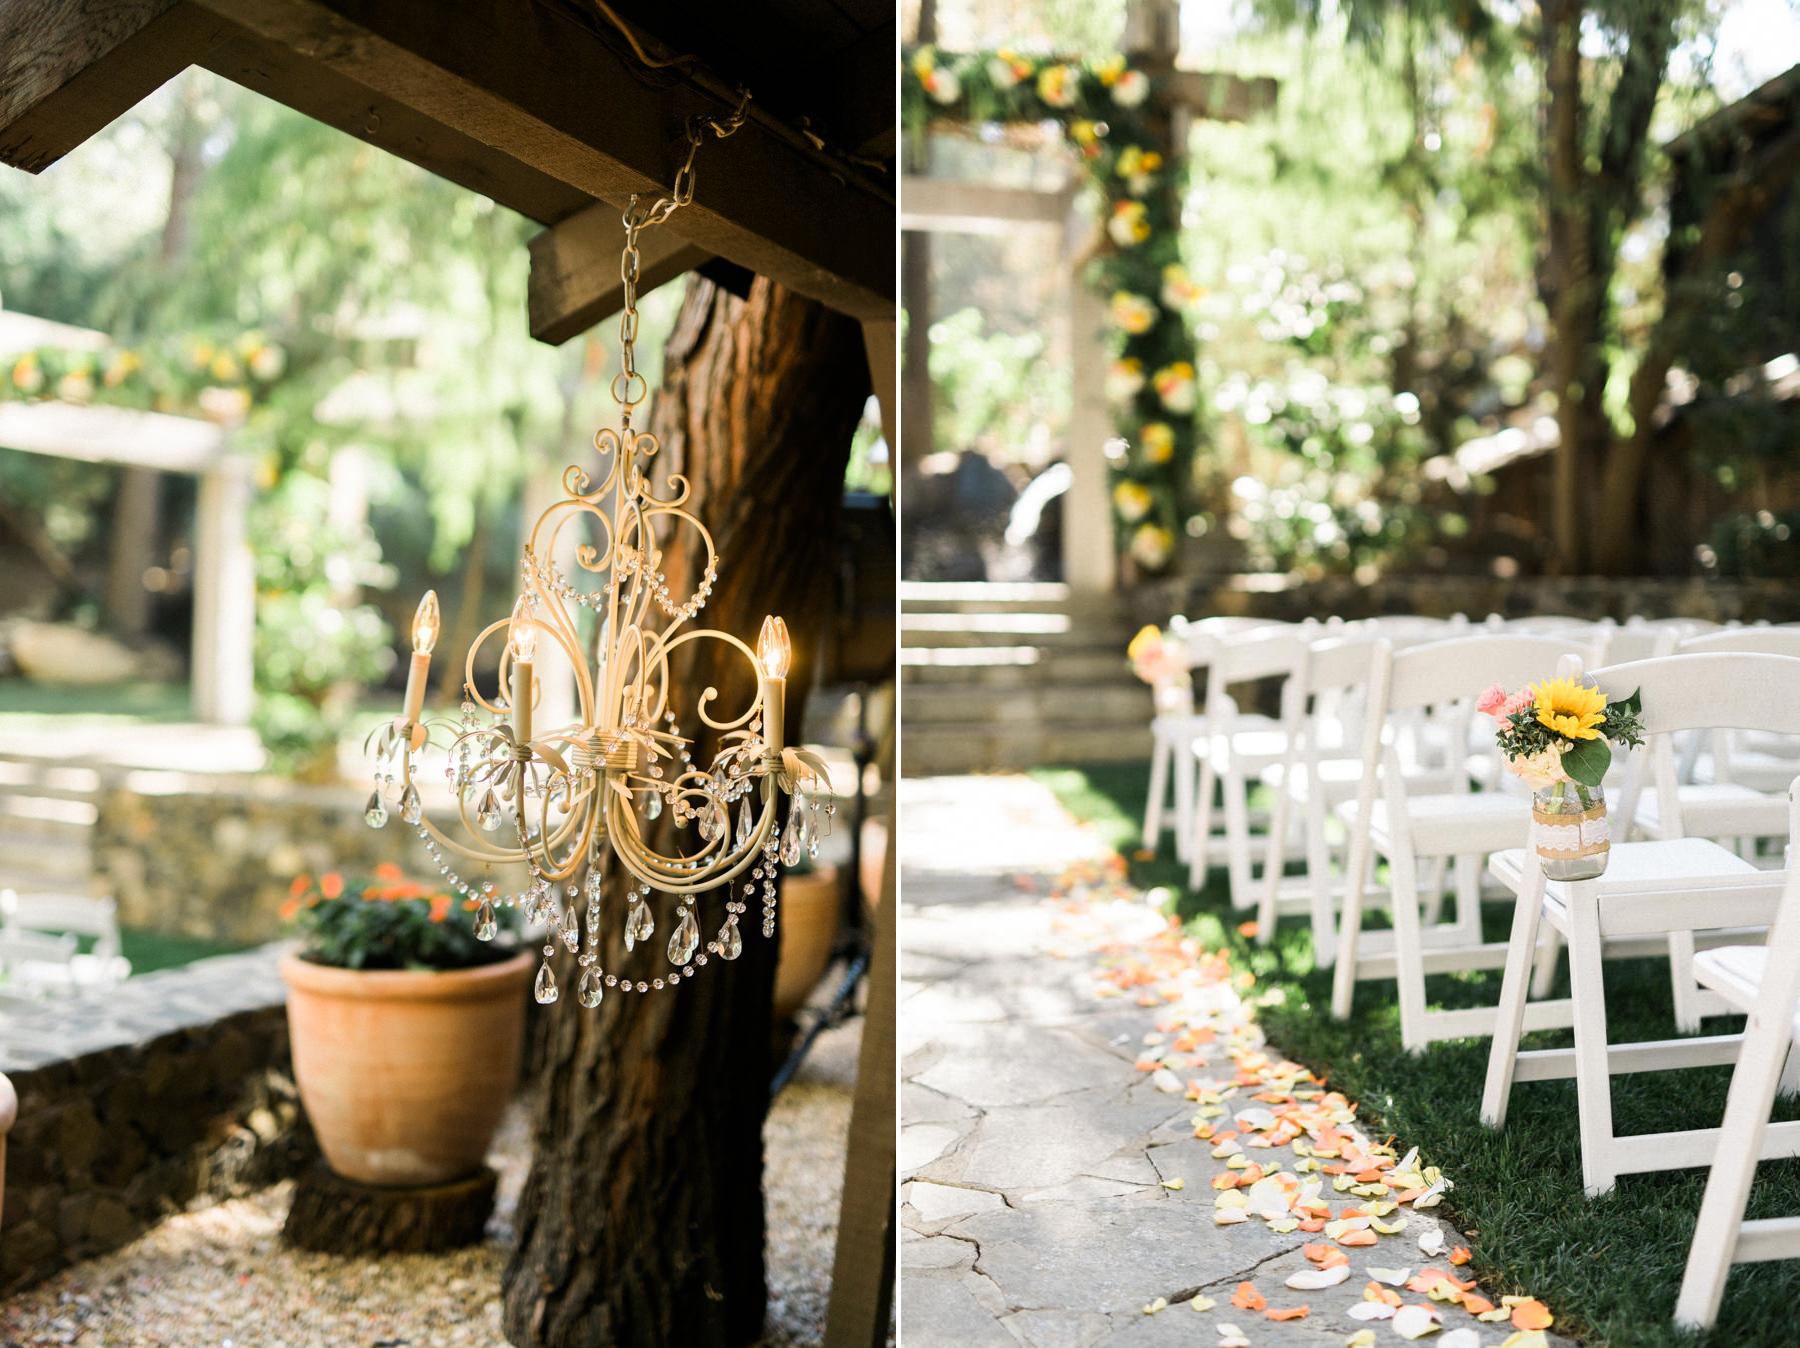 Calamigos Ranch Redwood Room wedding 021.jpg